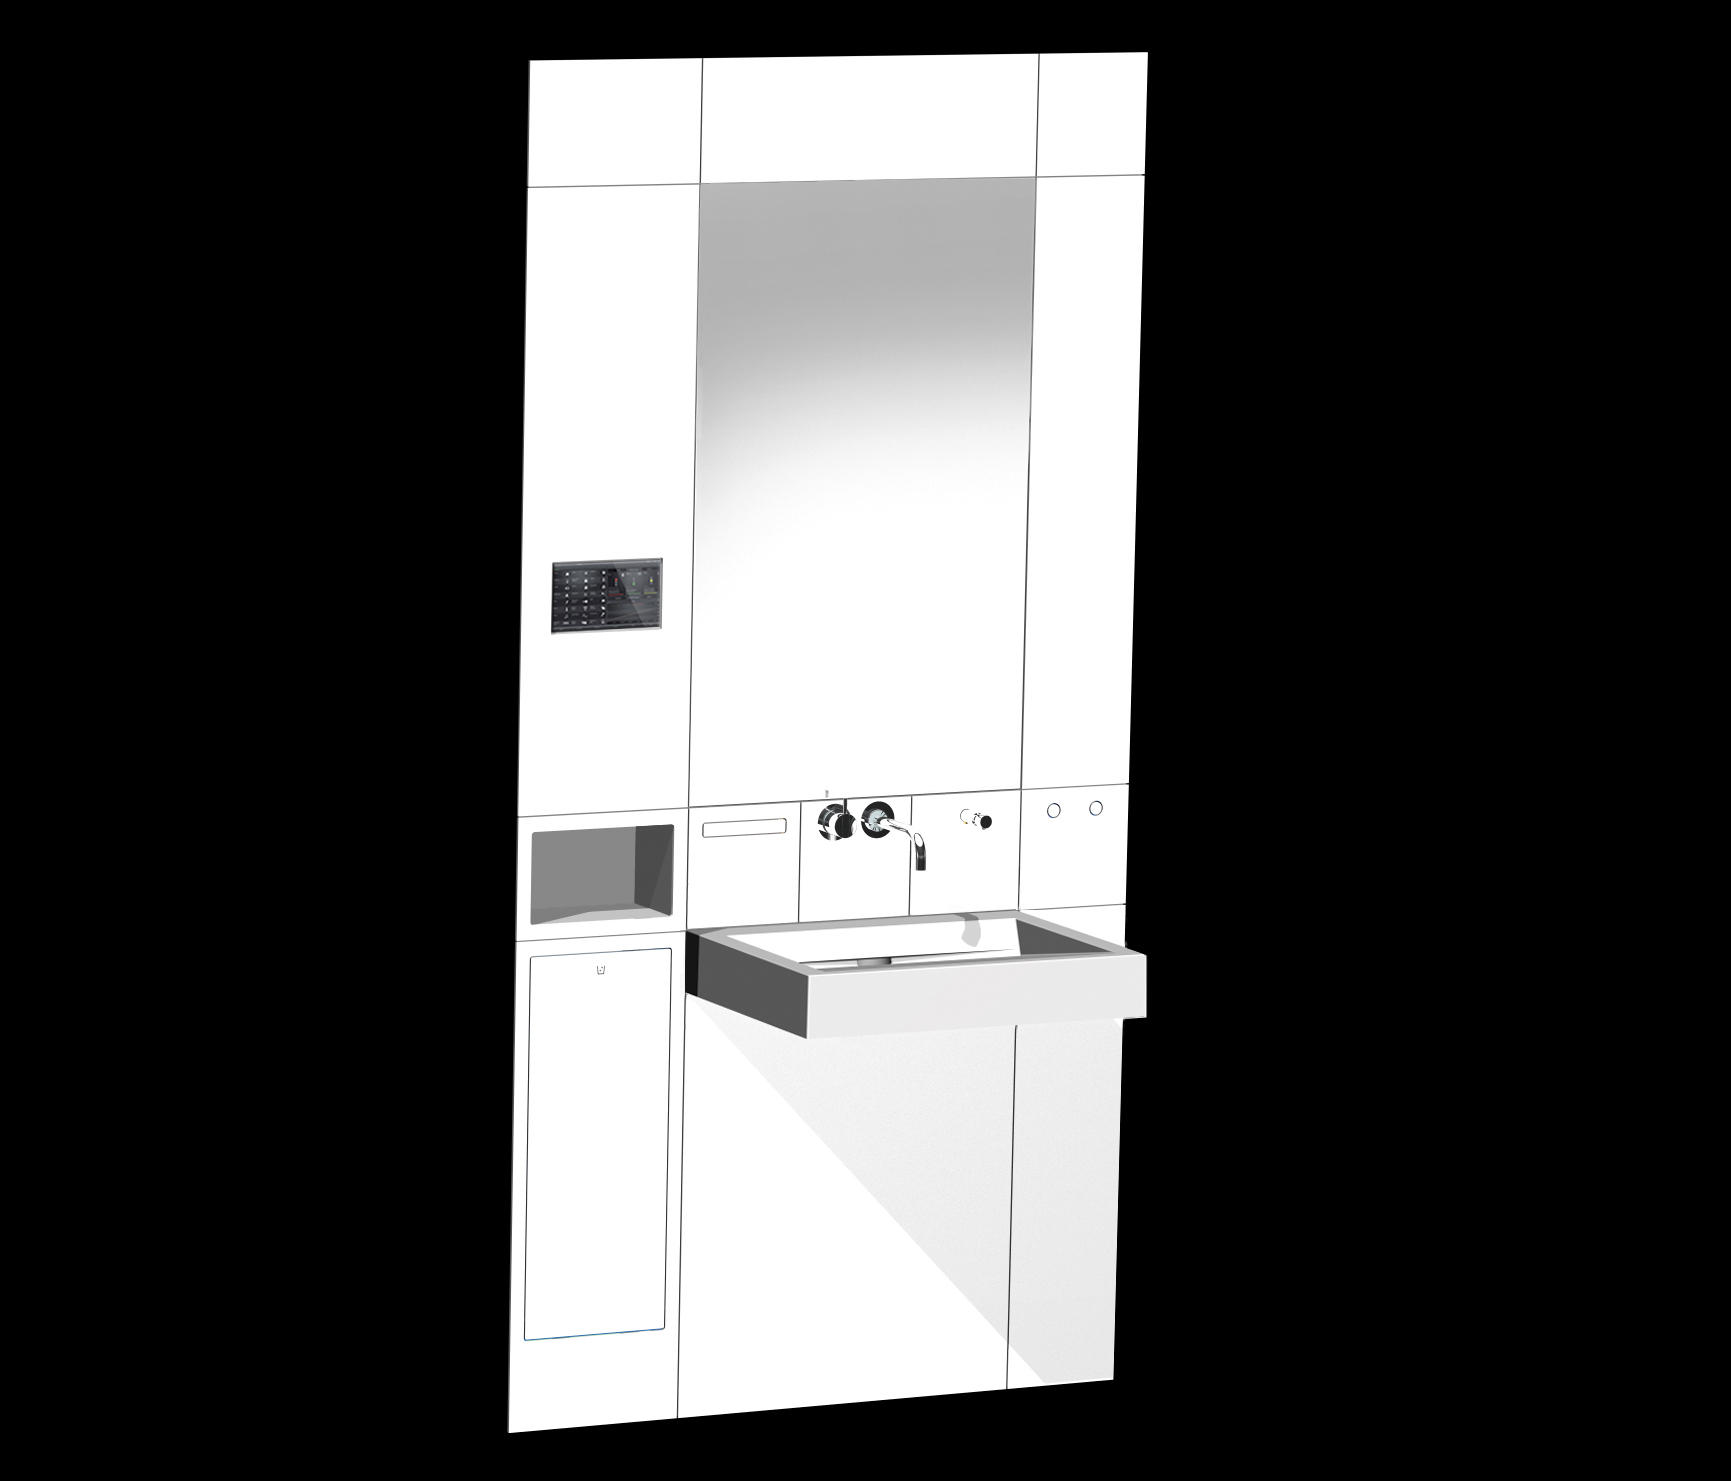 soundmodul waschpl tze von hewi architonic. Black Bedroom Furniture Sets. Home Design Ideas